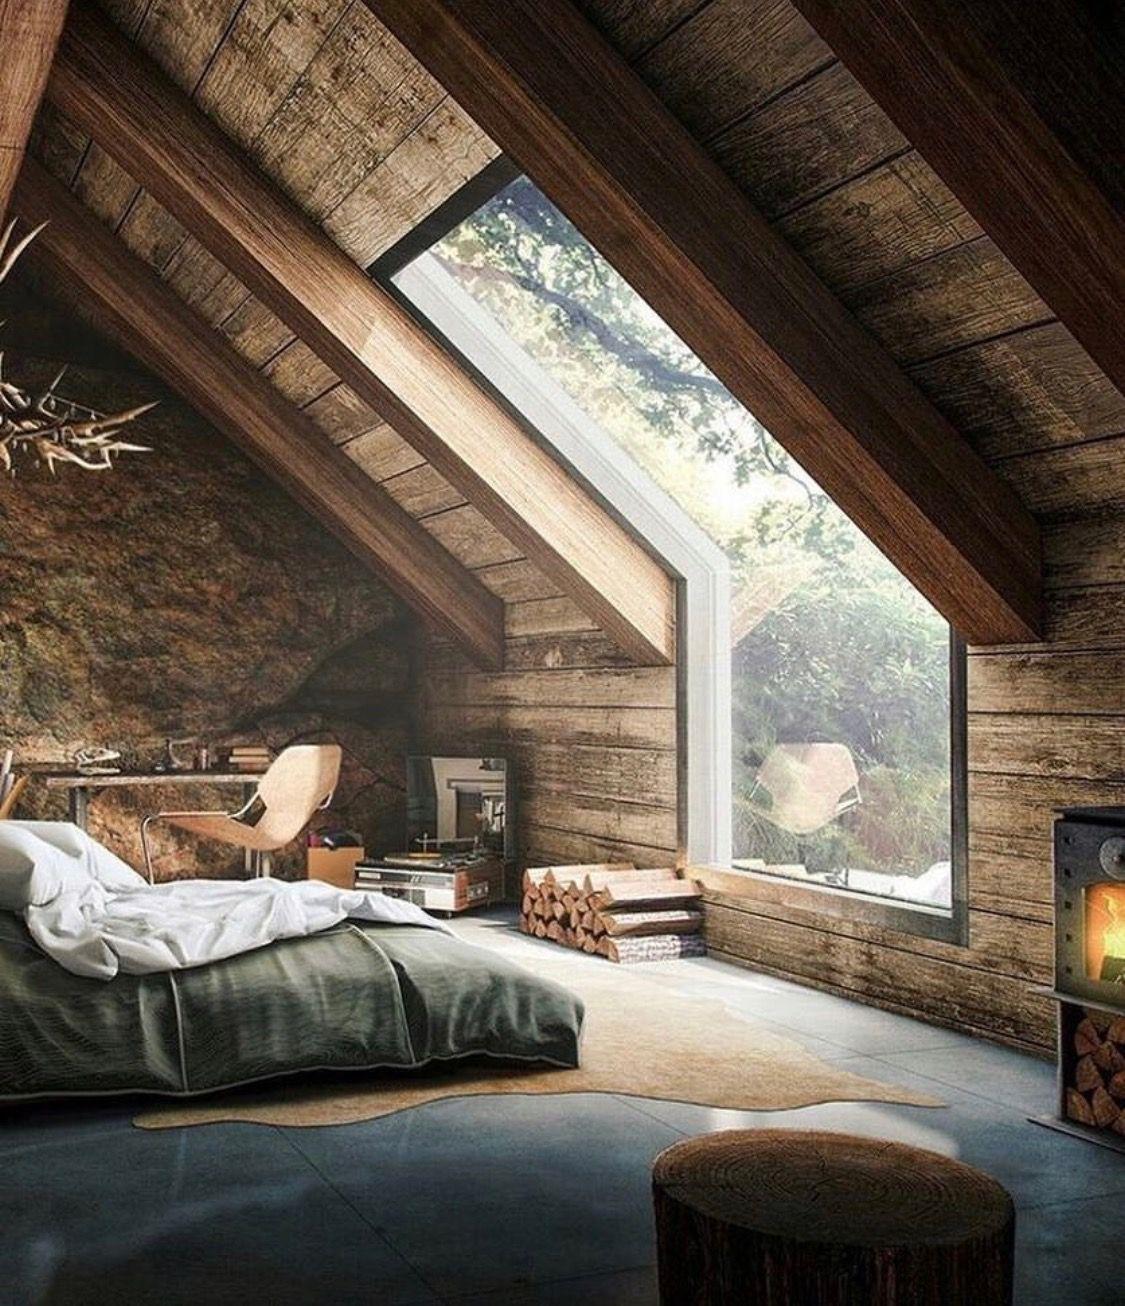 Bedroom Boards Ideas Collection pincindy welton on nesting instinct | pinterest | attic